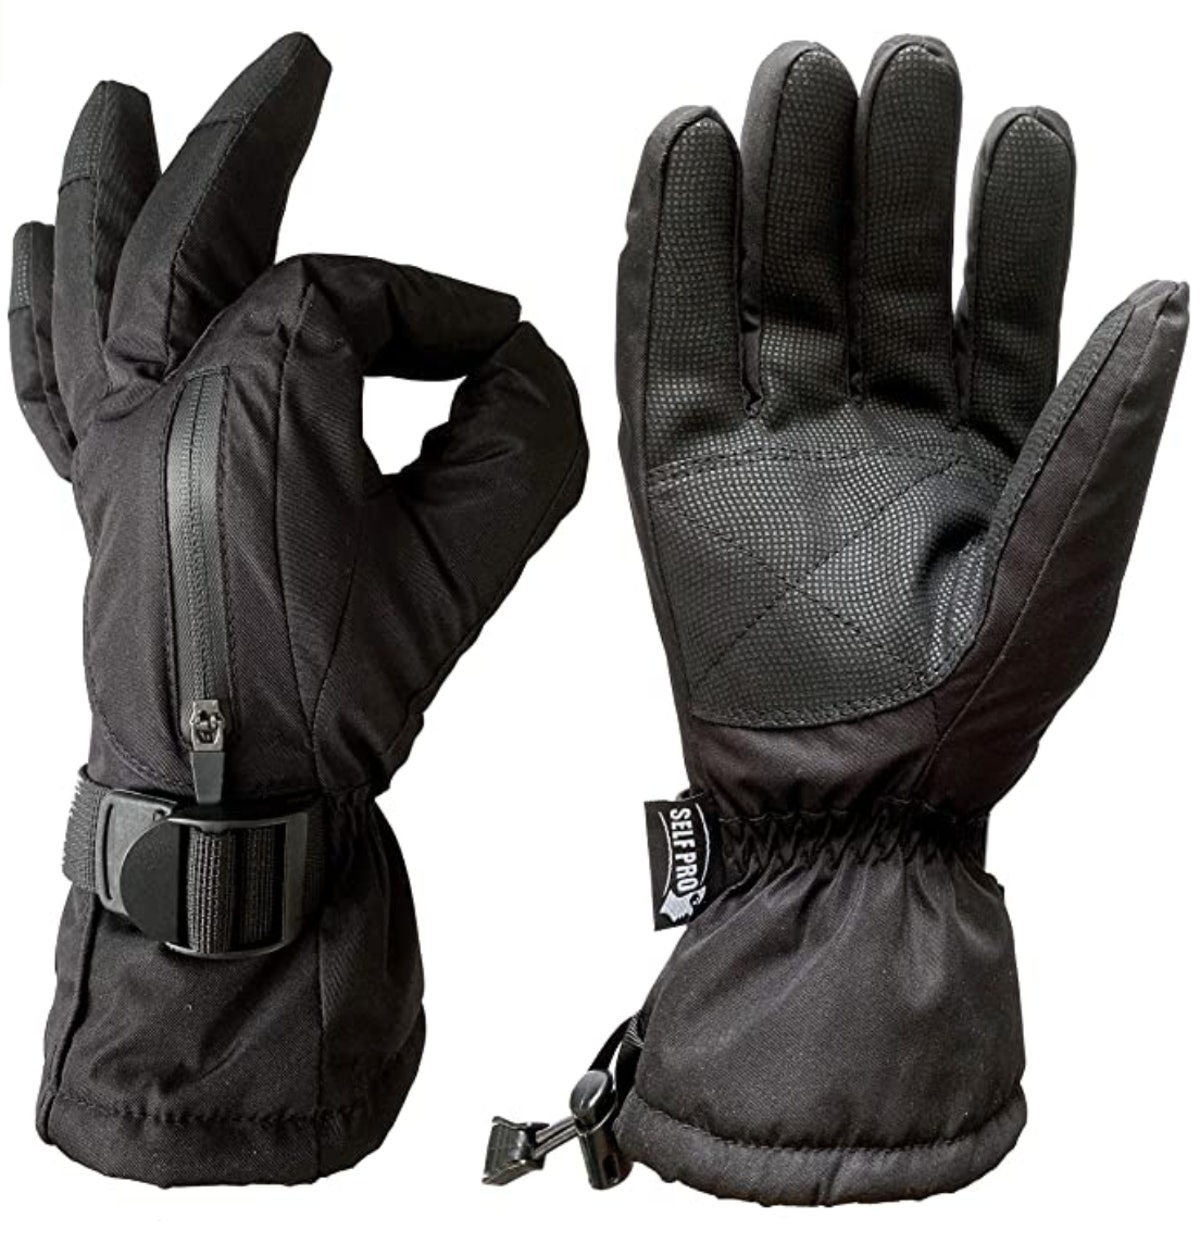 Self Pro 3M Thinsulate Black Gauntlet Gloves